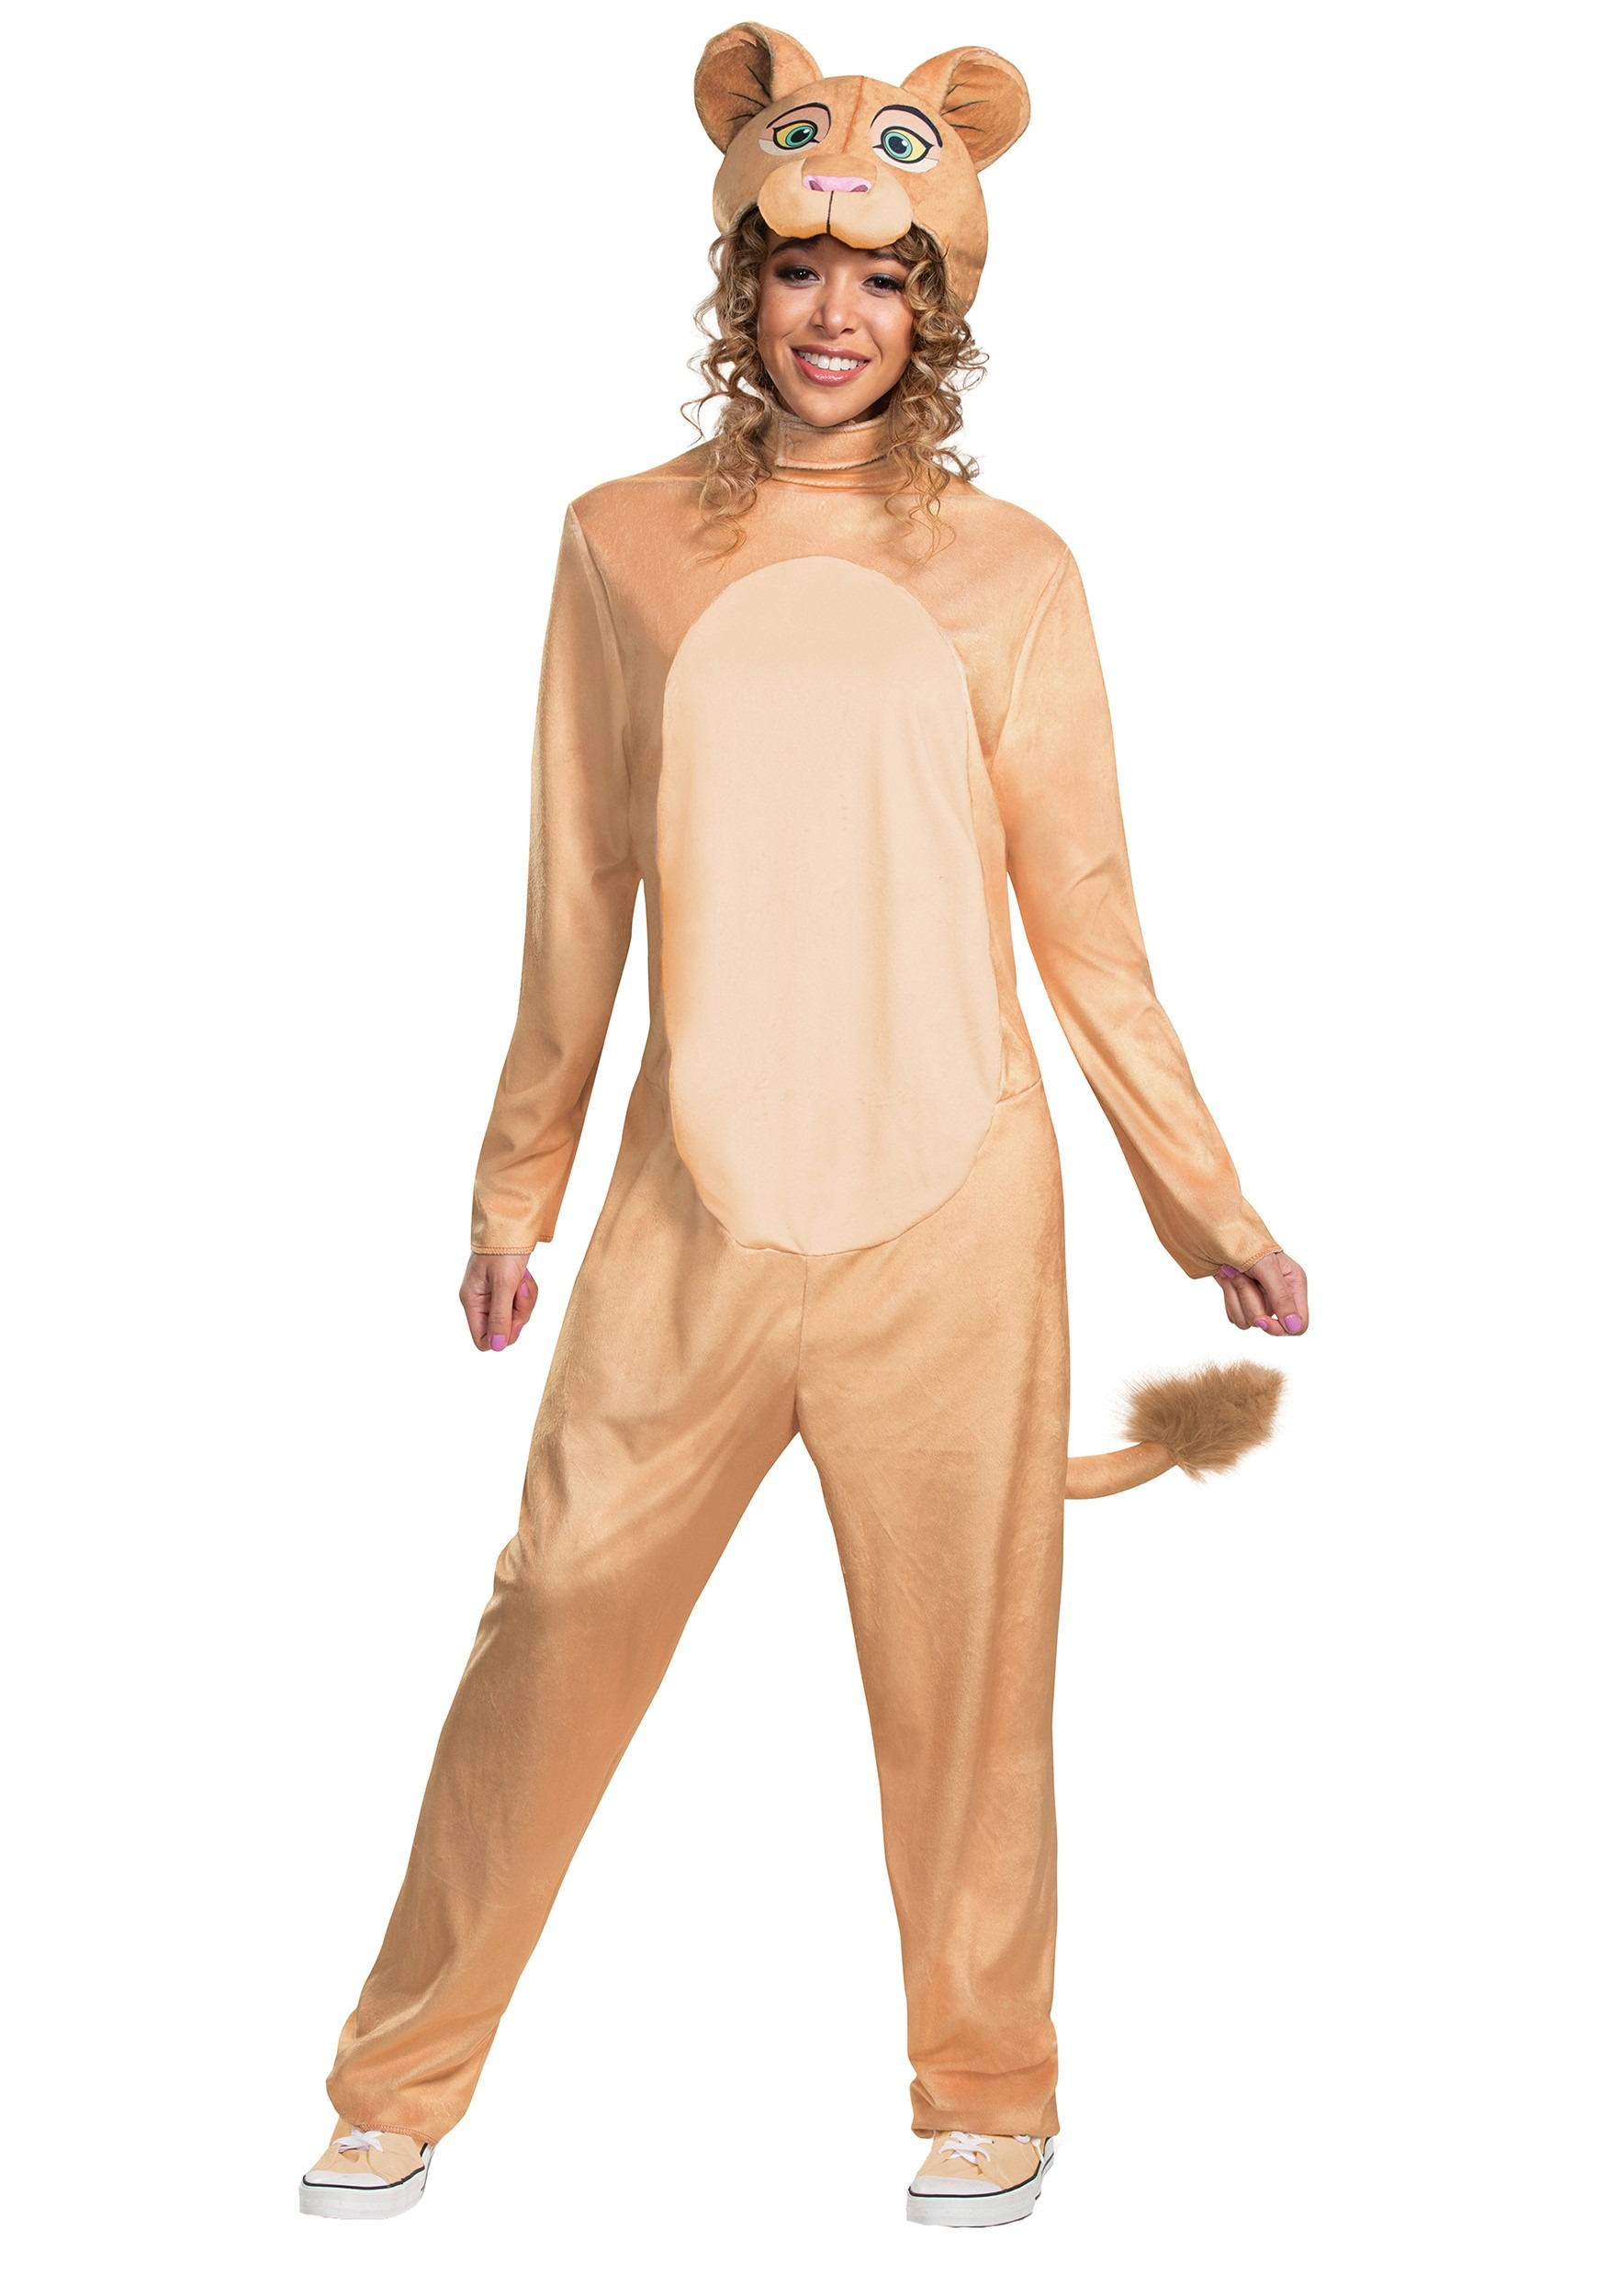 Disney Animated Lion King Women's Nala Jumpsuit Costume